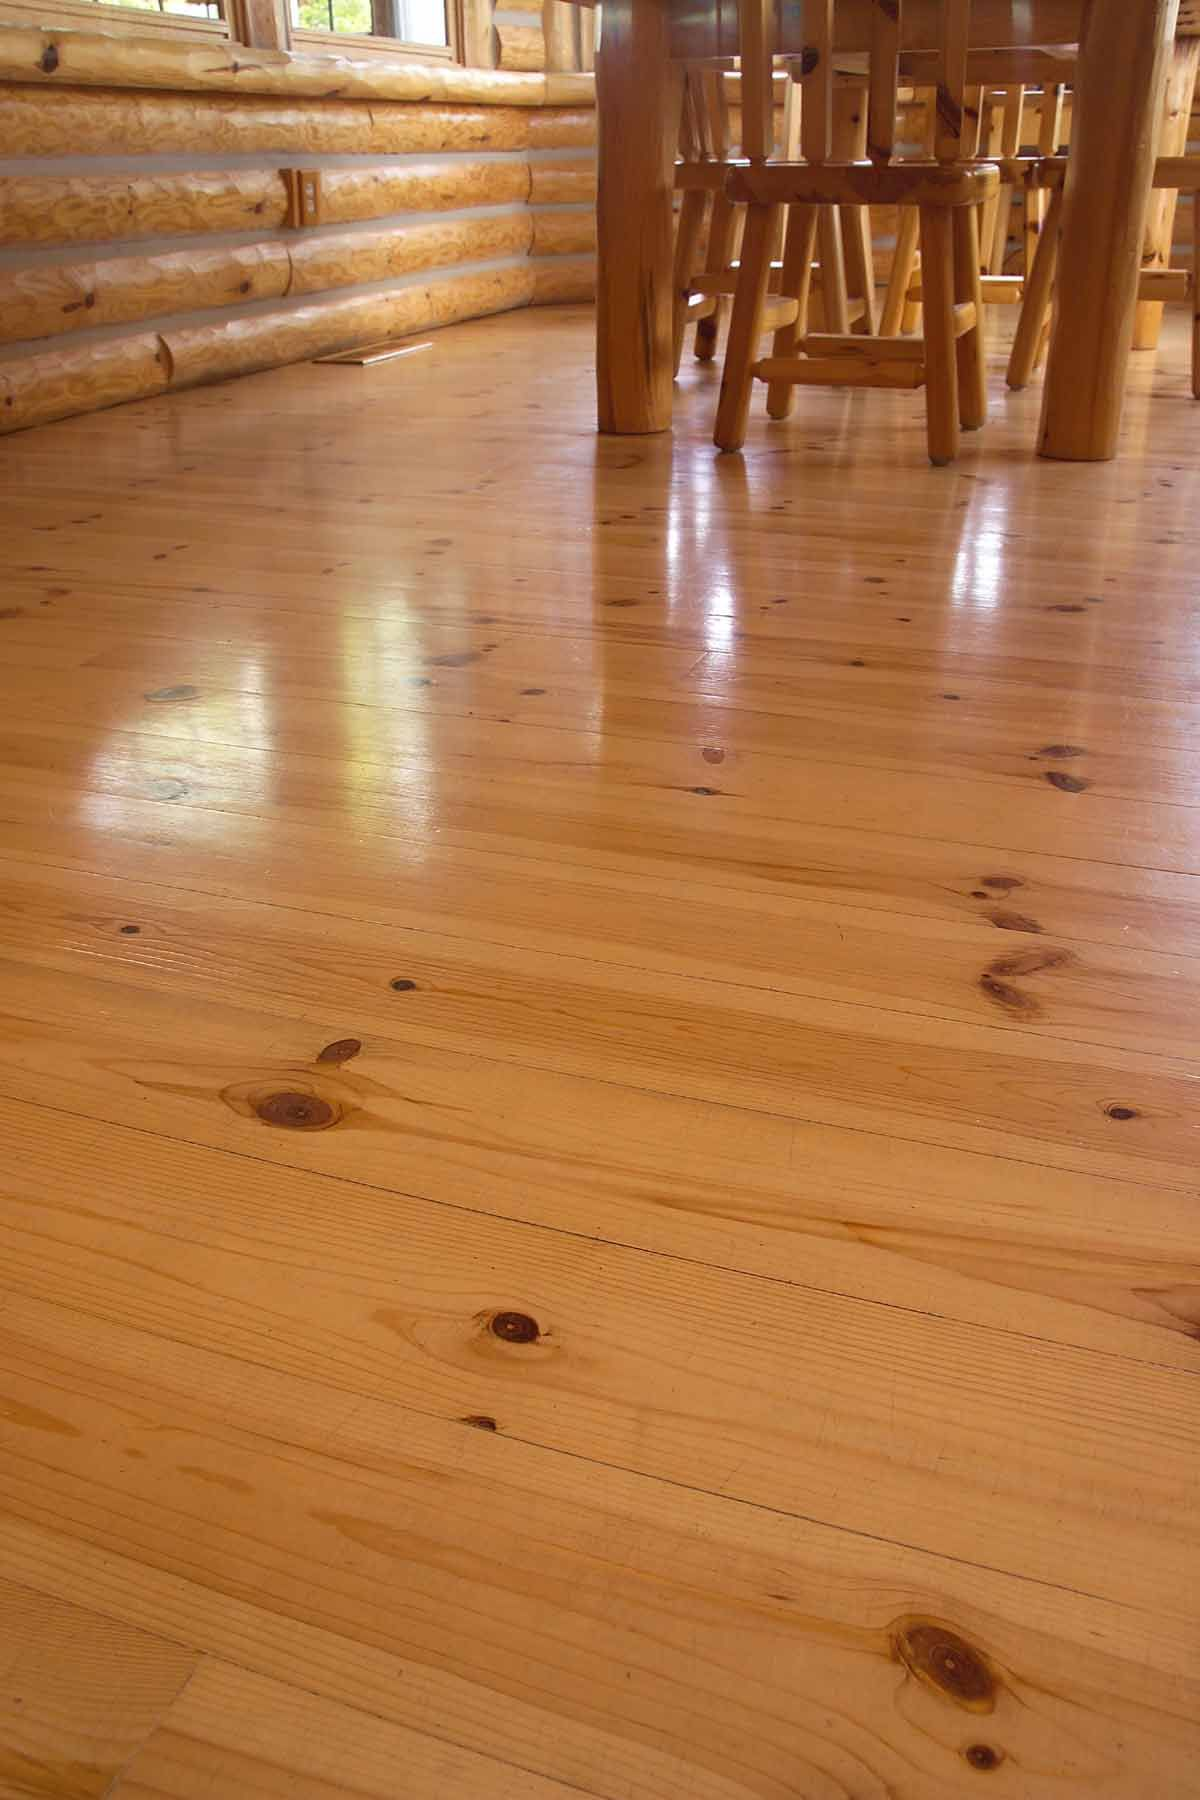 Pin On Wood Floors, Wide Plank Knotty Pine Laminate Flooring